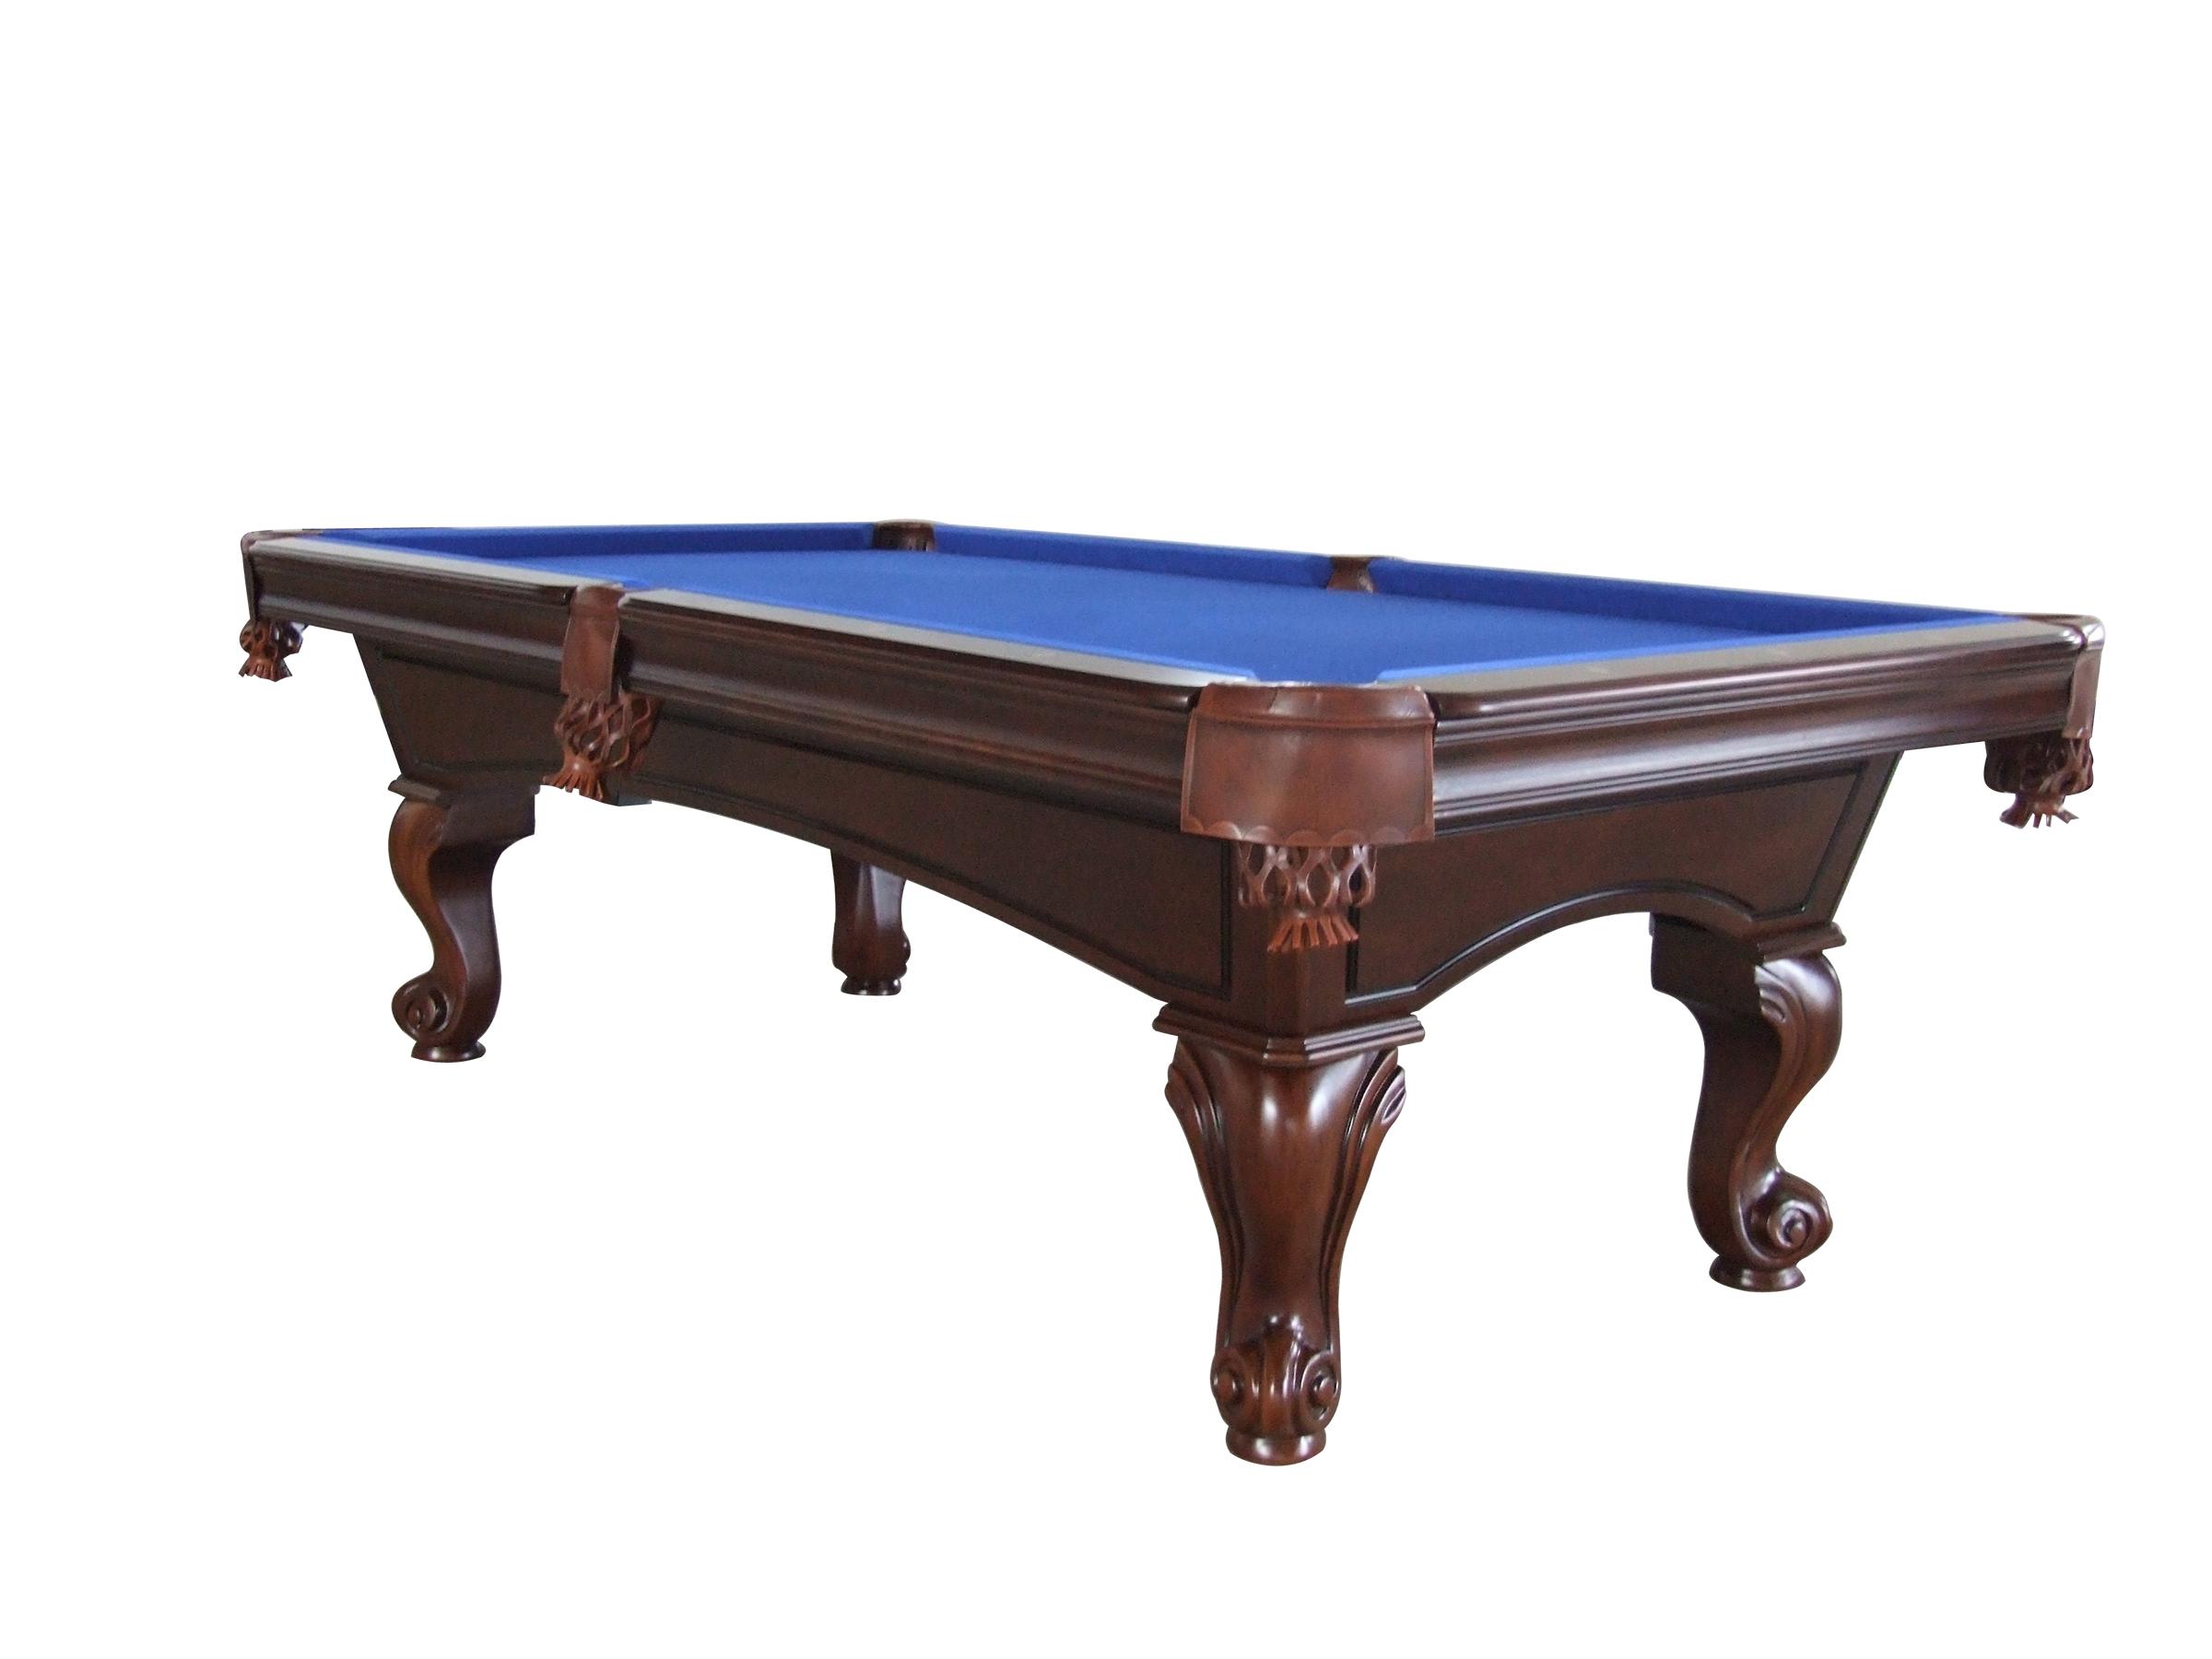 Elite Series Royale pool table